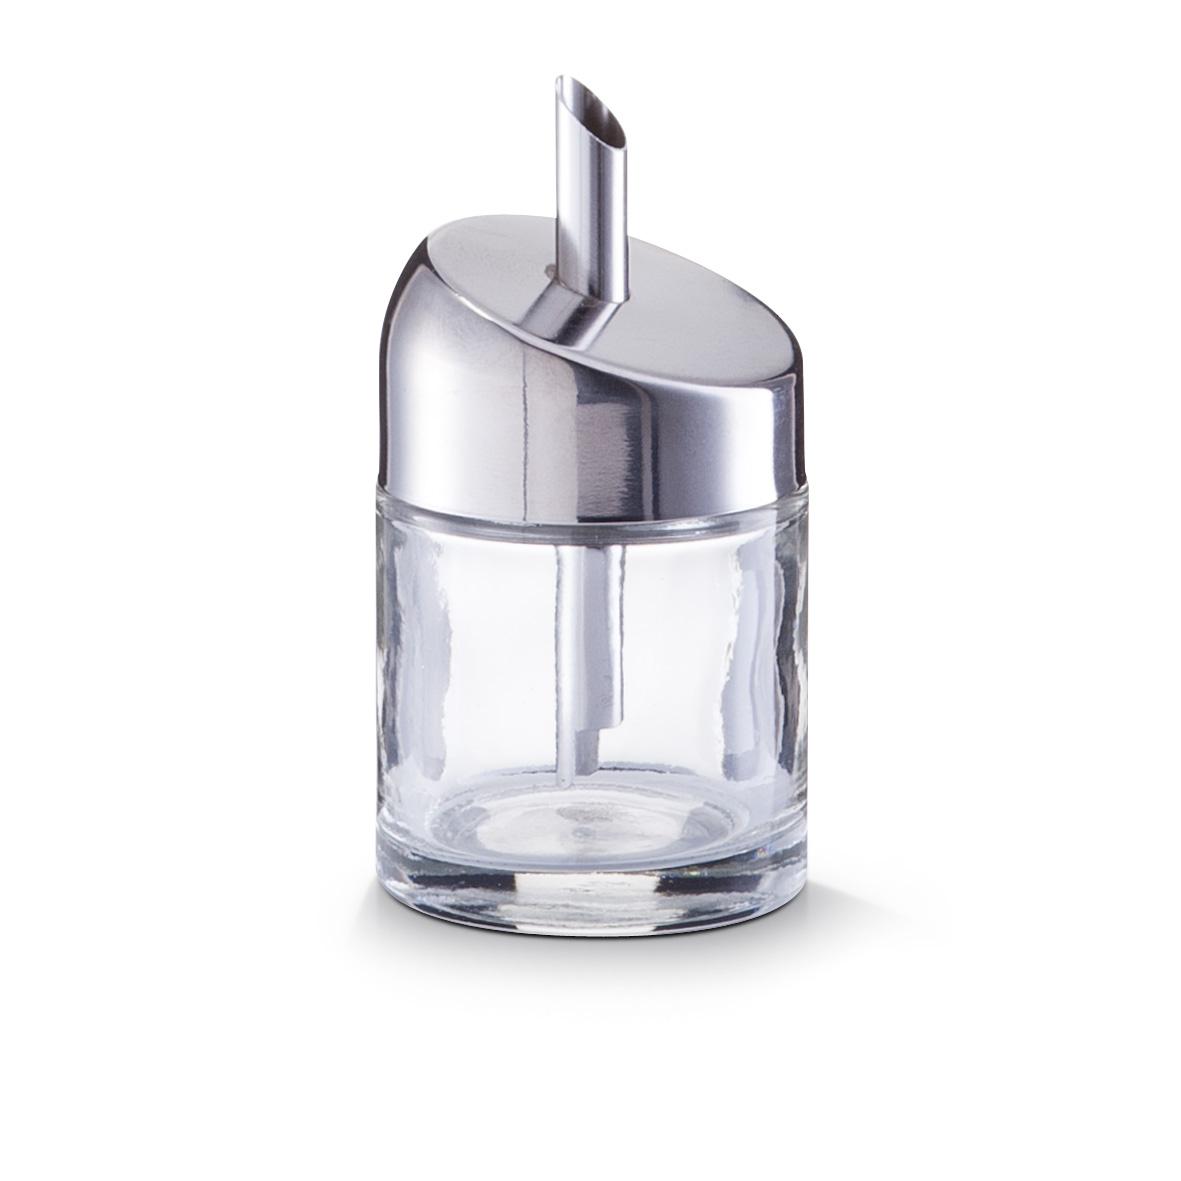 Емкость для сахара d-6х11 см<br>